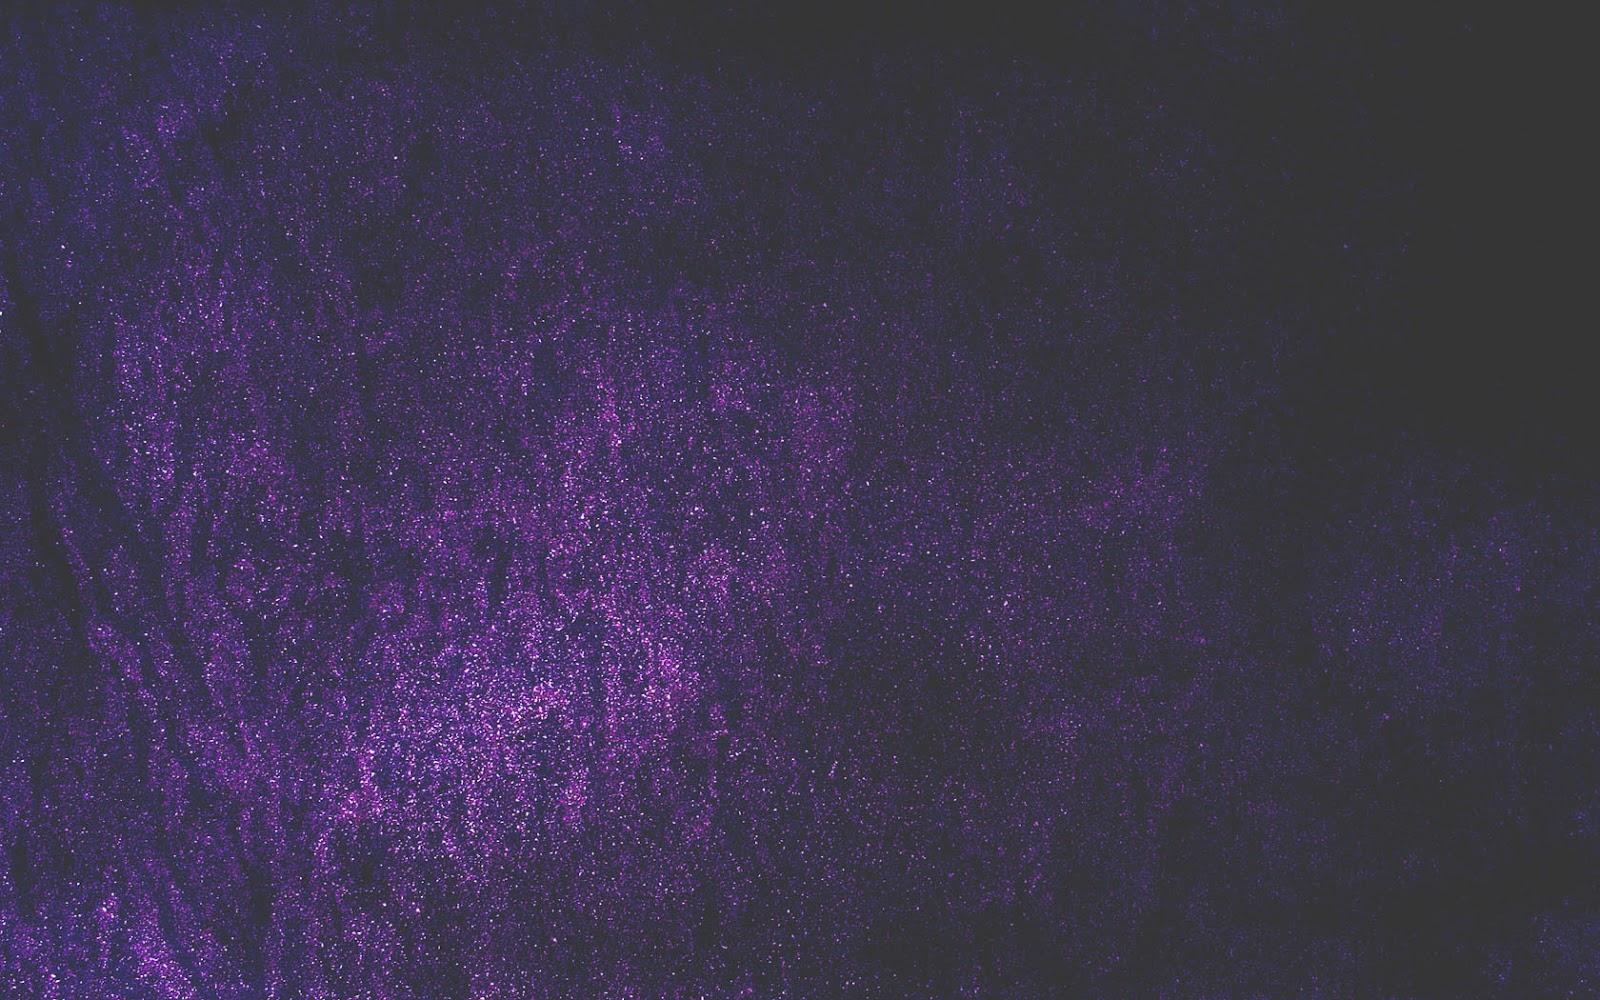 Purple tumblr background